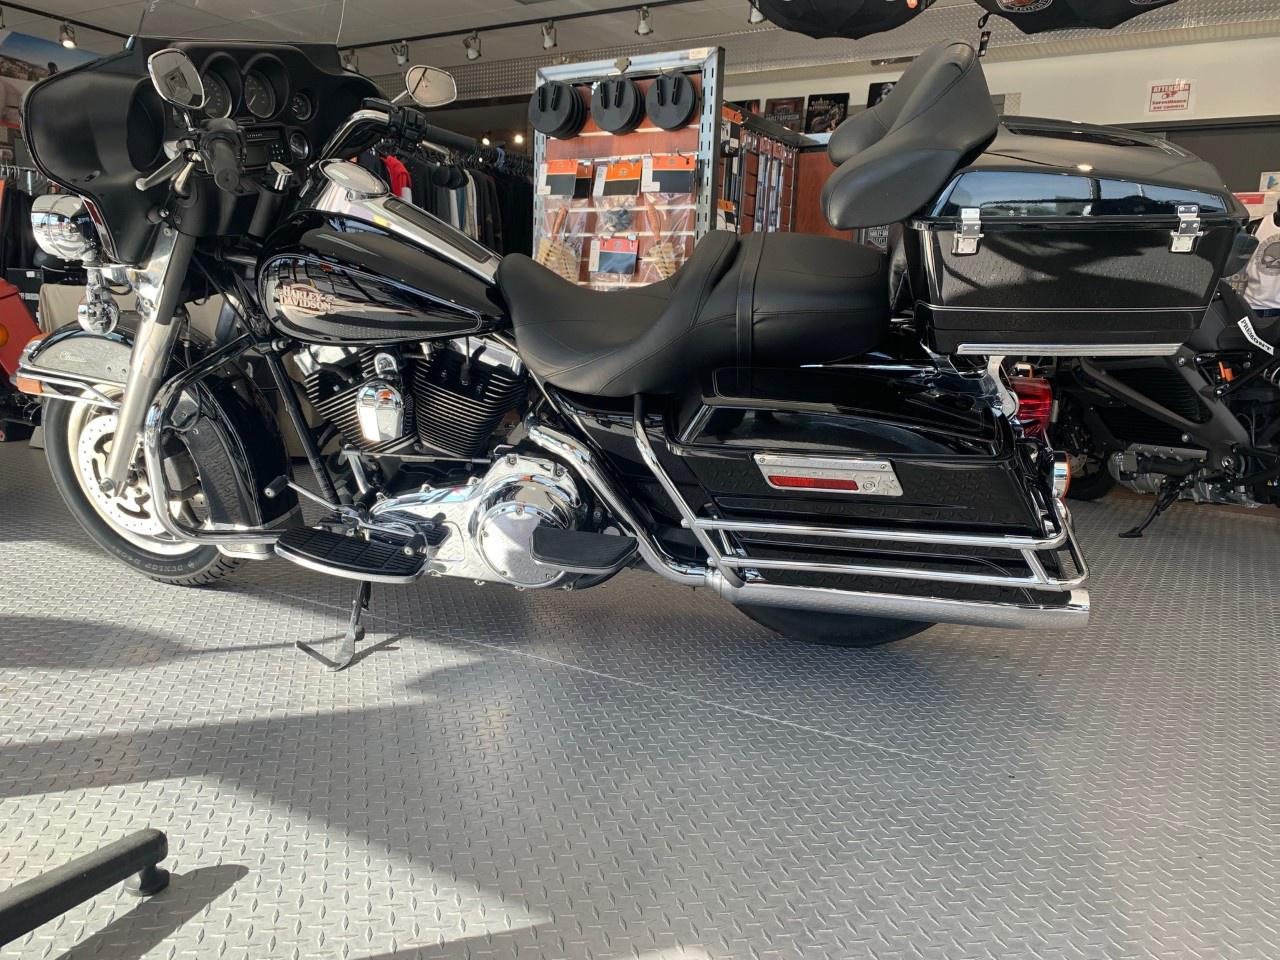 Harley-Davidson FLHTC Electra Glide Classic 2008